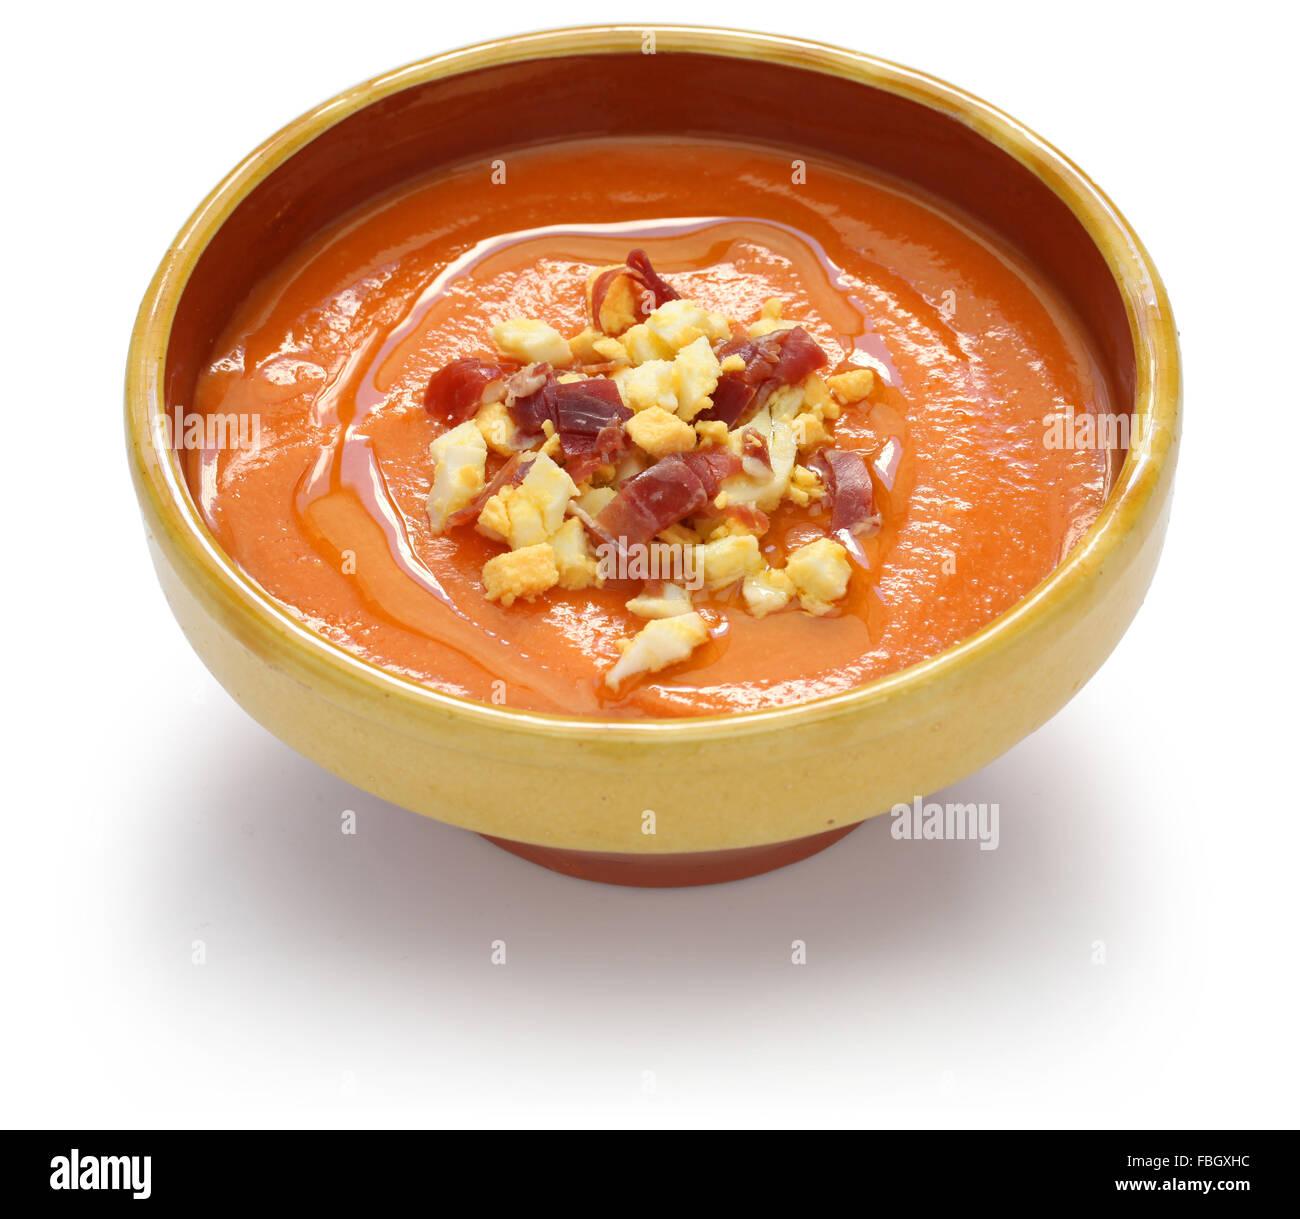 salmorejo, chilled tomato soup, spanish food isolated on white background - Stock Image